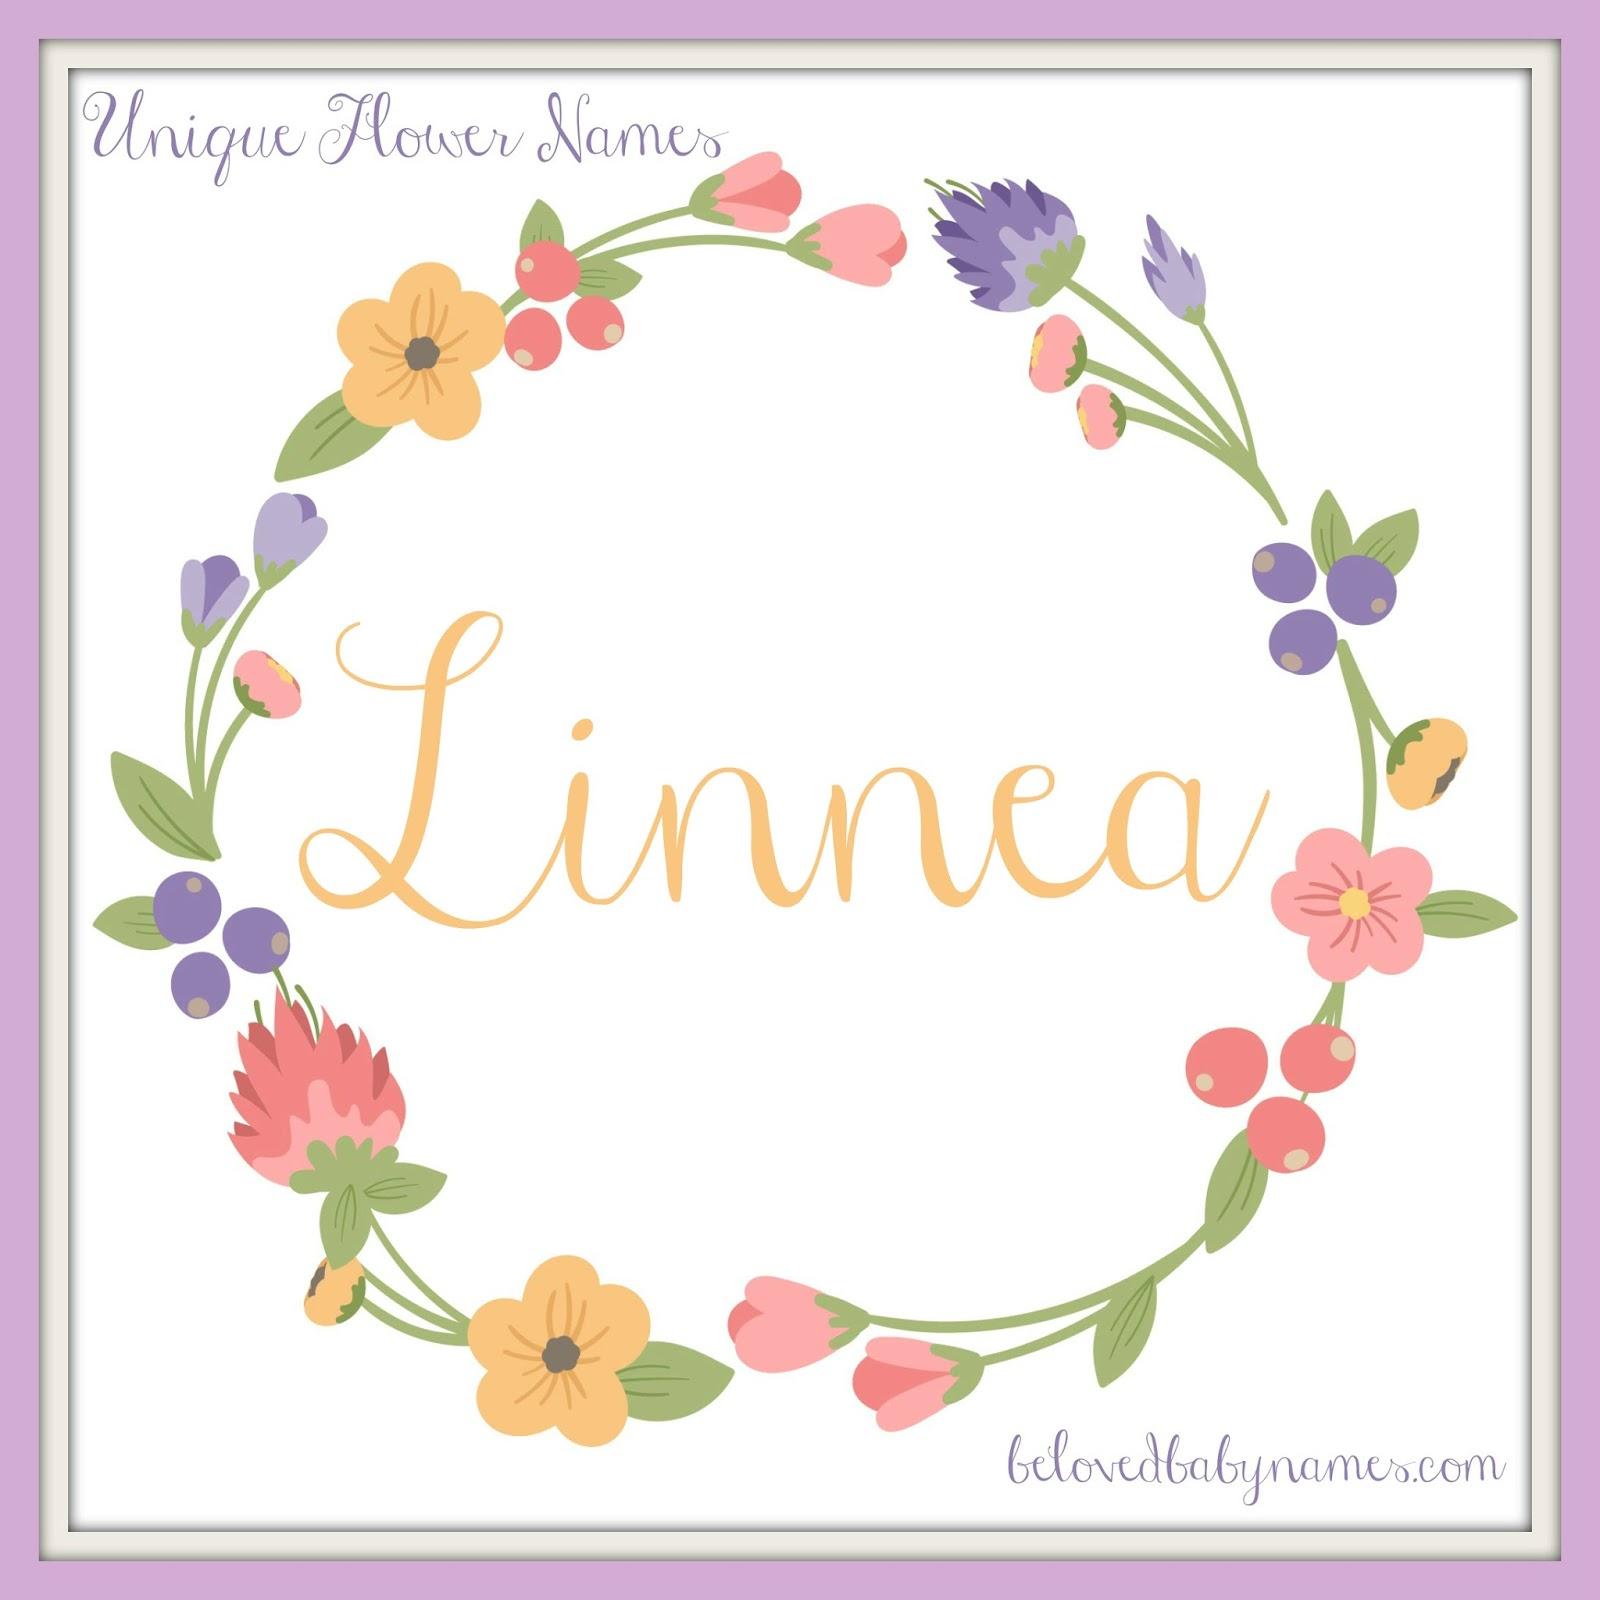 Beloved Baby Names Unique Flower Names